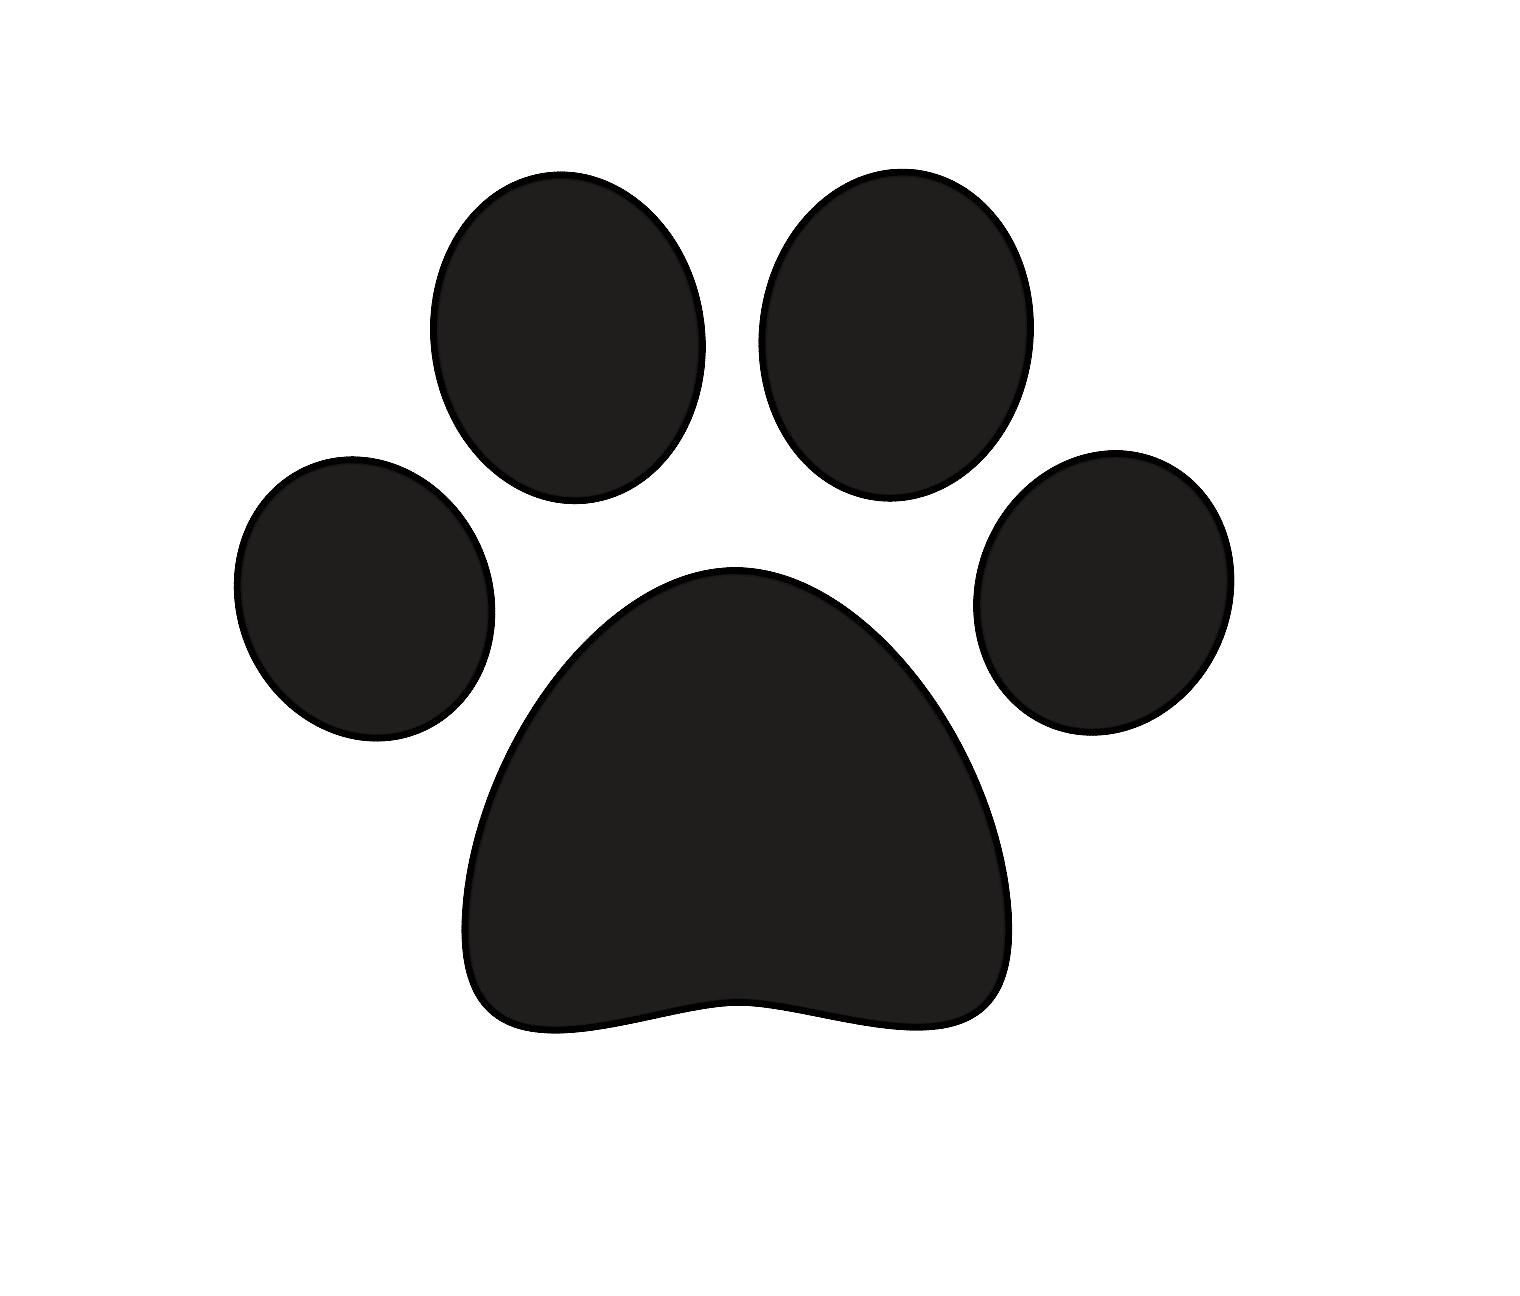 Paw icon image